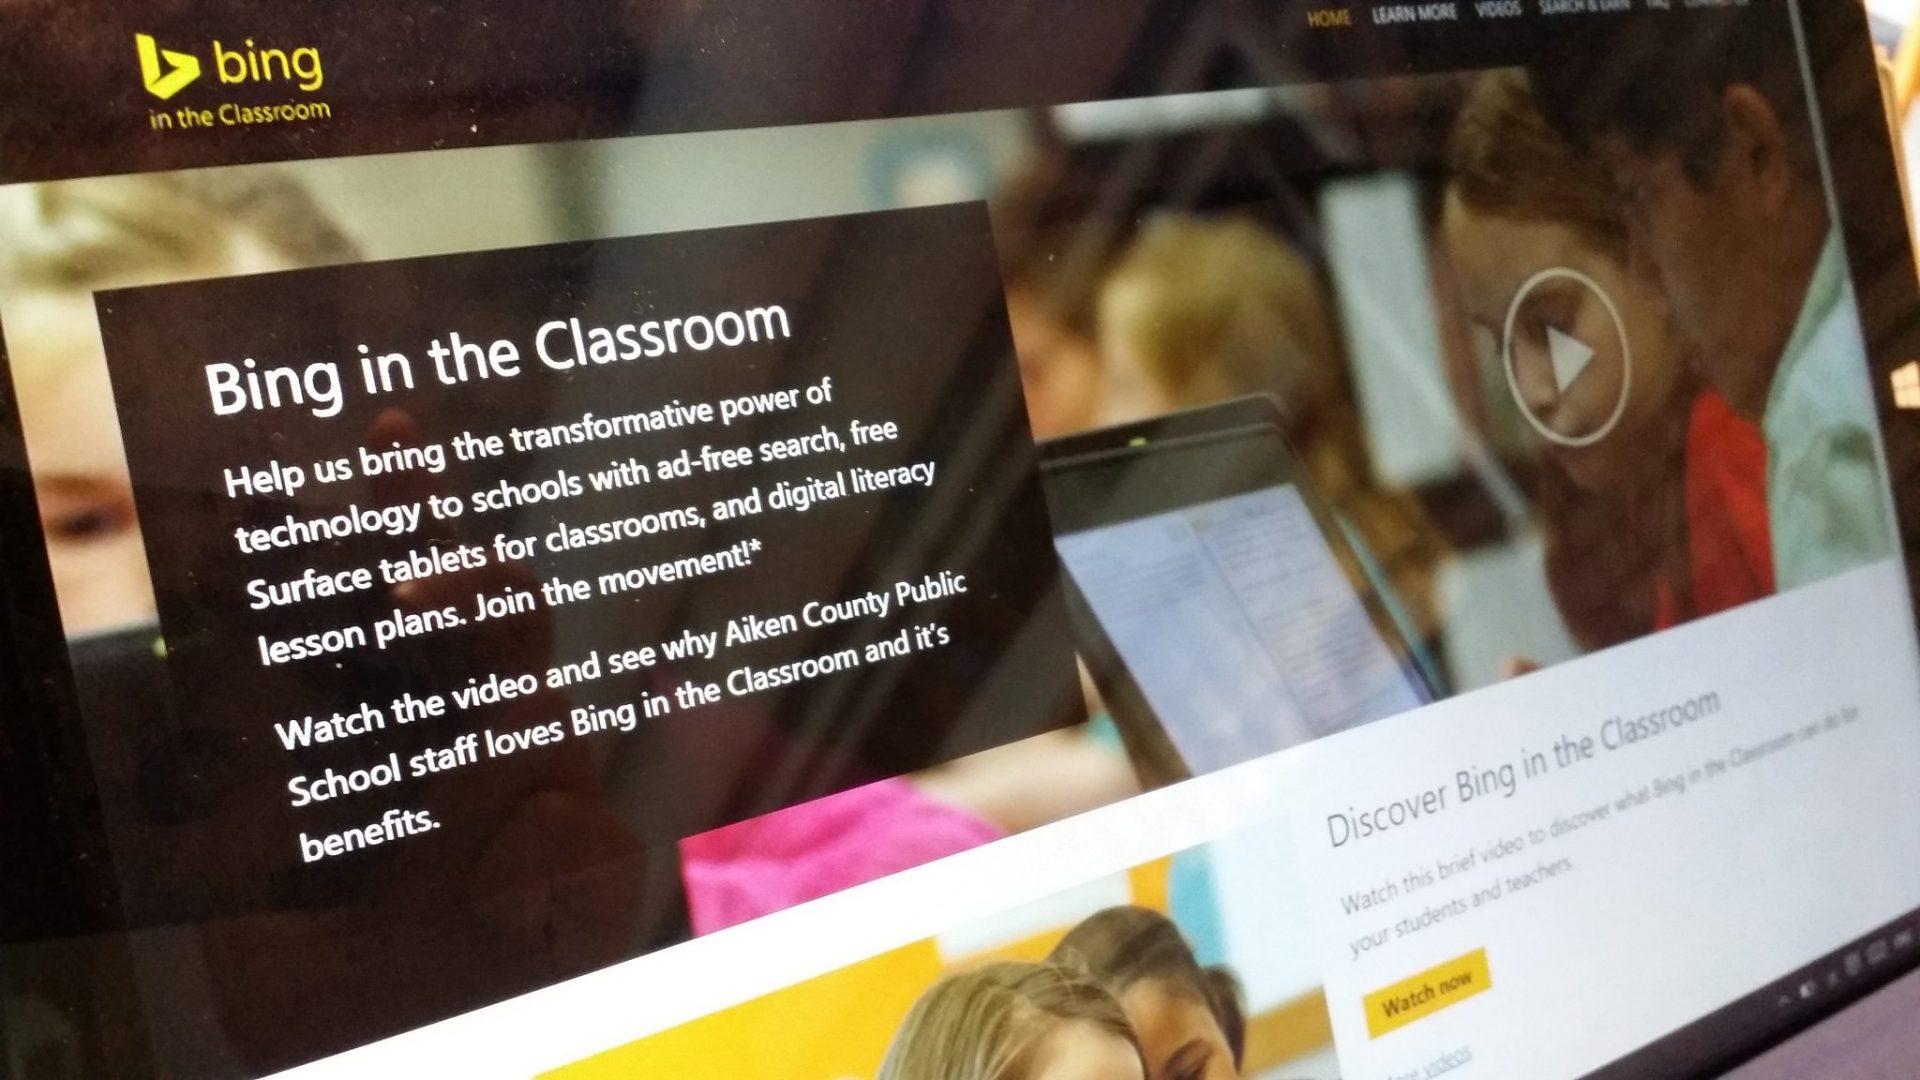 Microsoft highlights how Office 365 Education helps keep